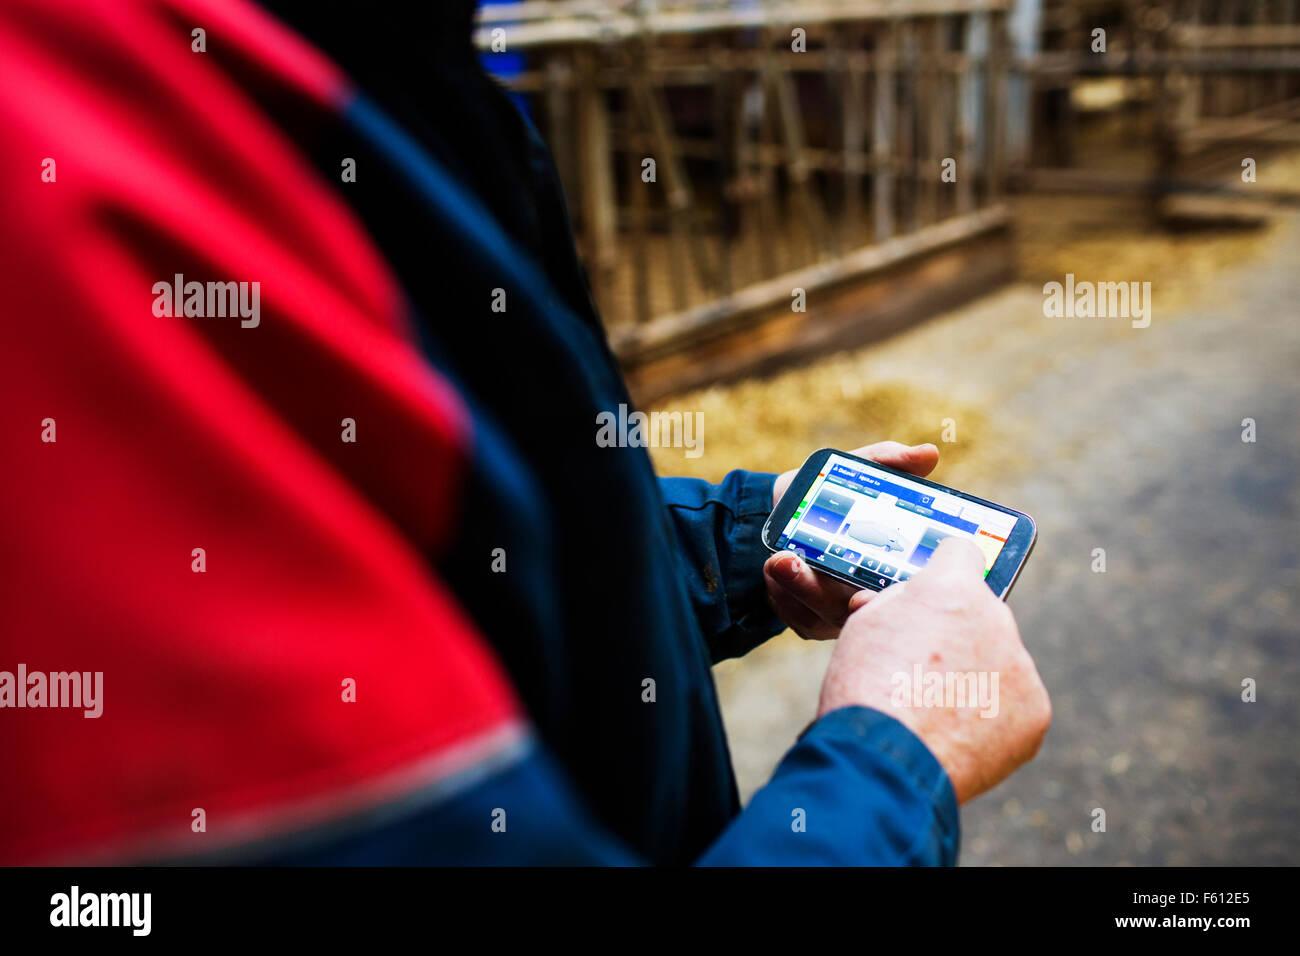 Mano humana usando smart phone en Dairy Farm Imagen De Stock